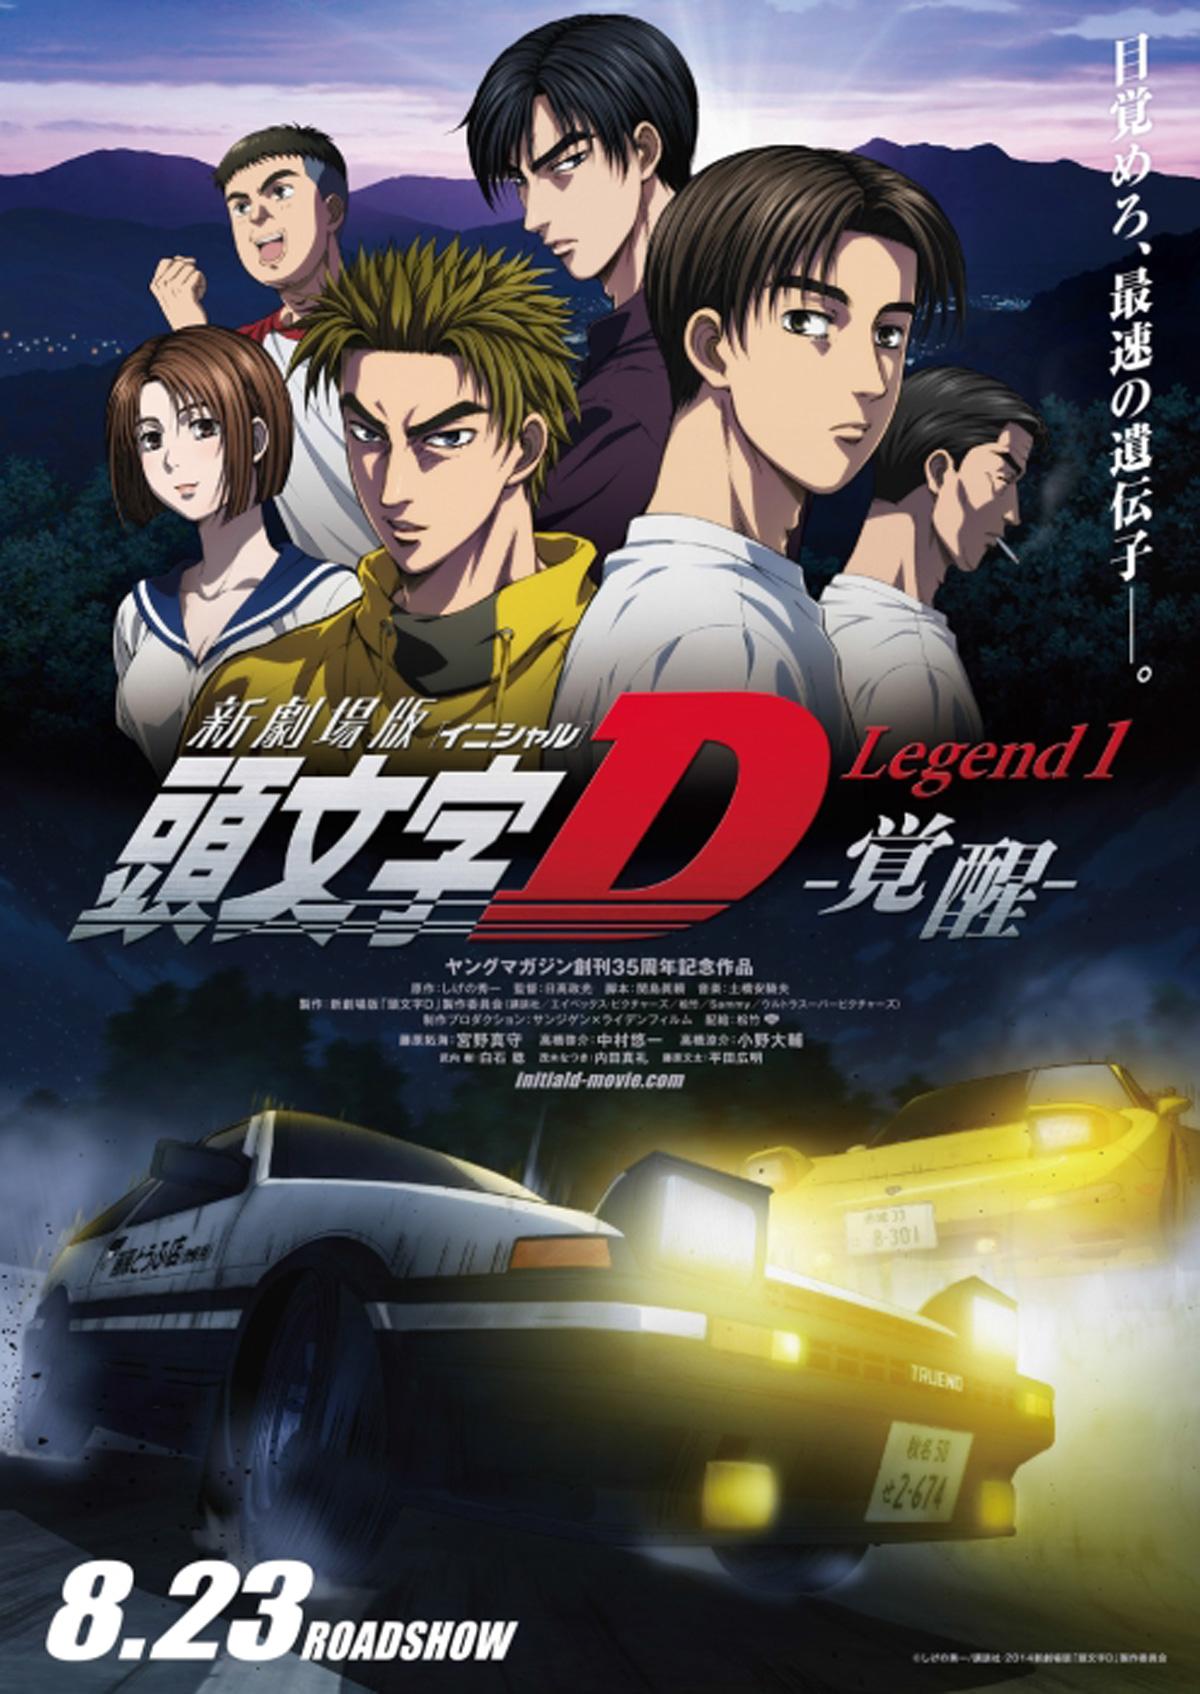 新劇場版 頭文字D Legend 1、2 見た